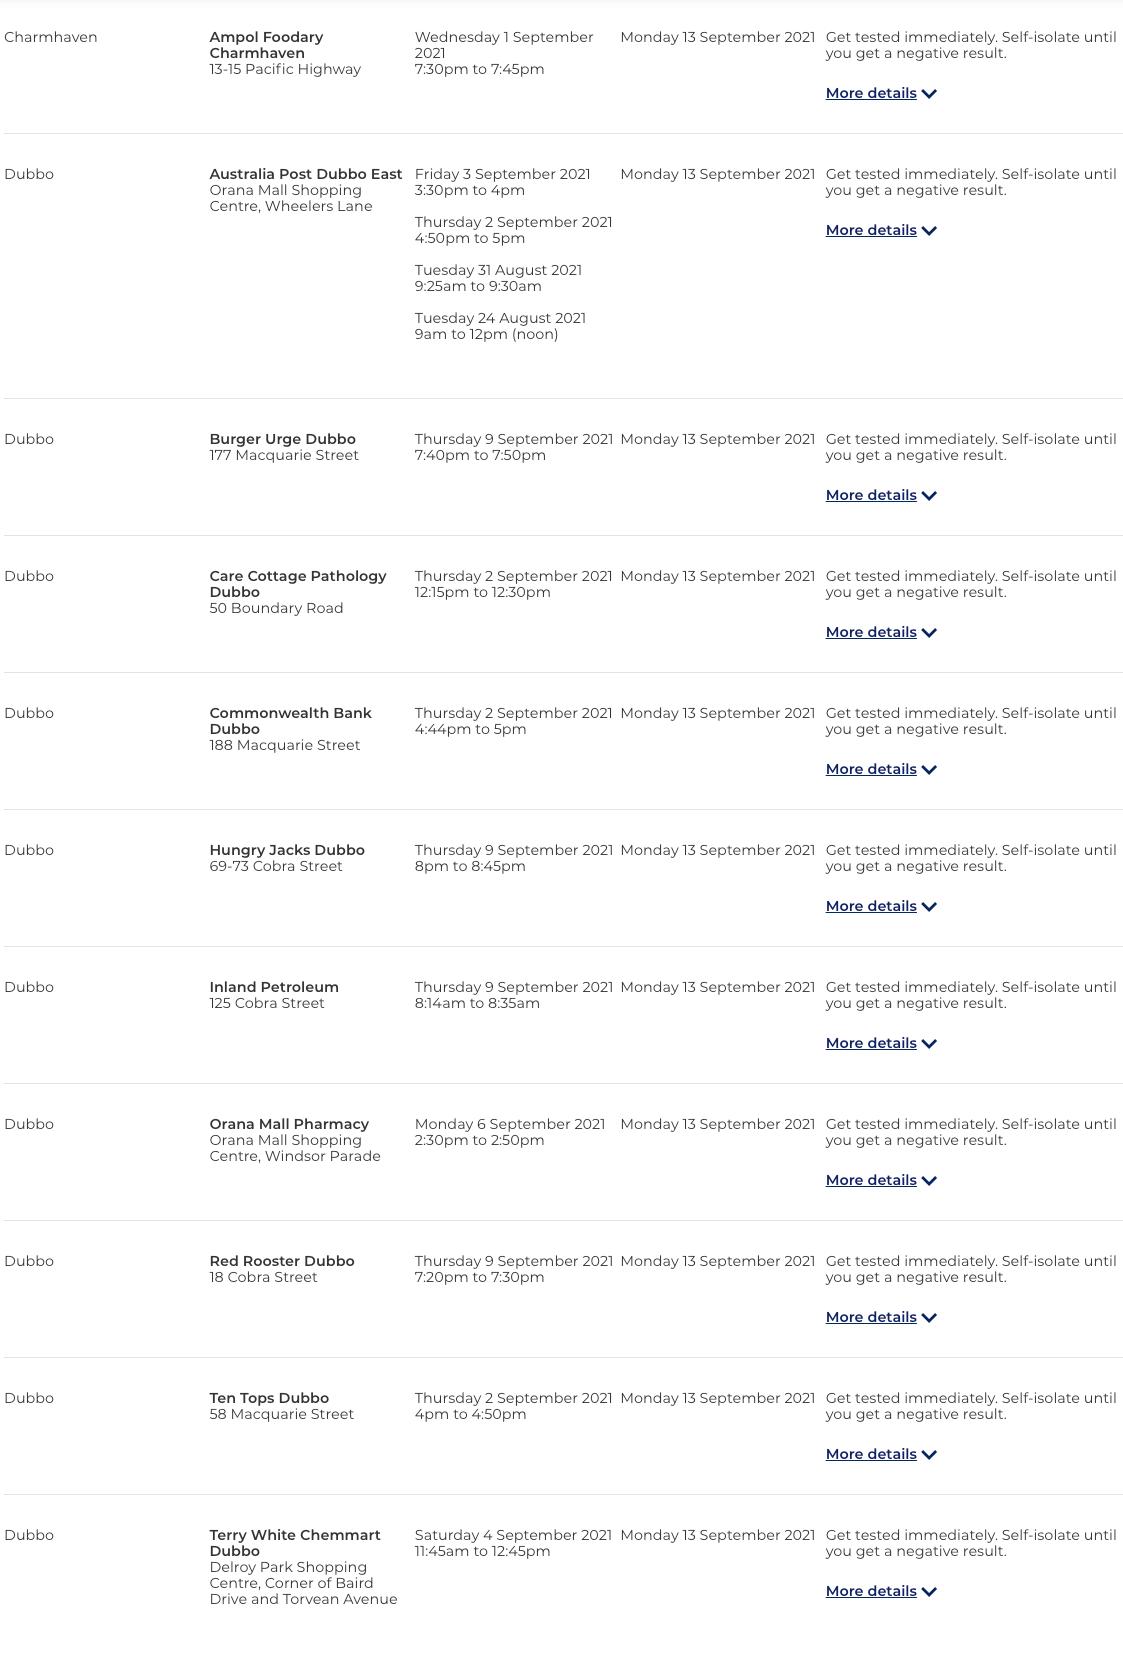 www.nsw.gov.au_covid-19_nsw-covid-19-case-locations_case-locations (30)的副本.png